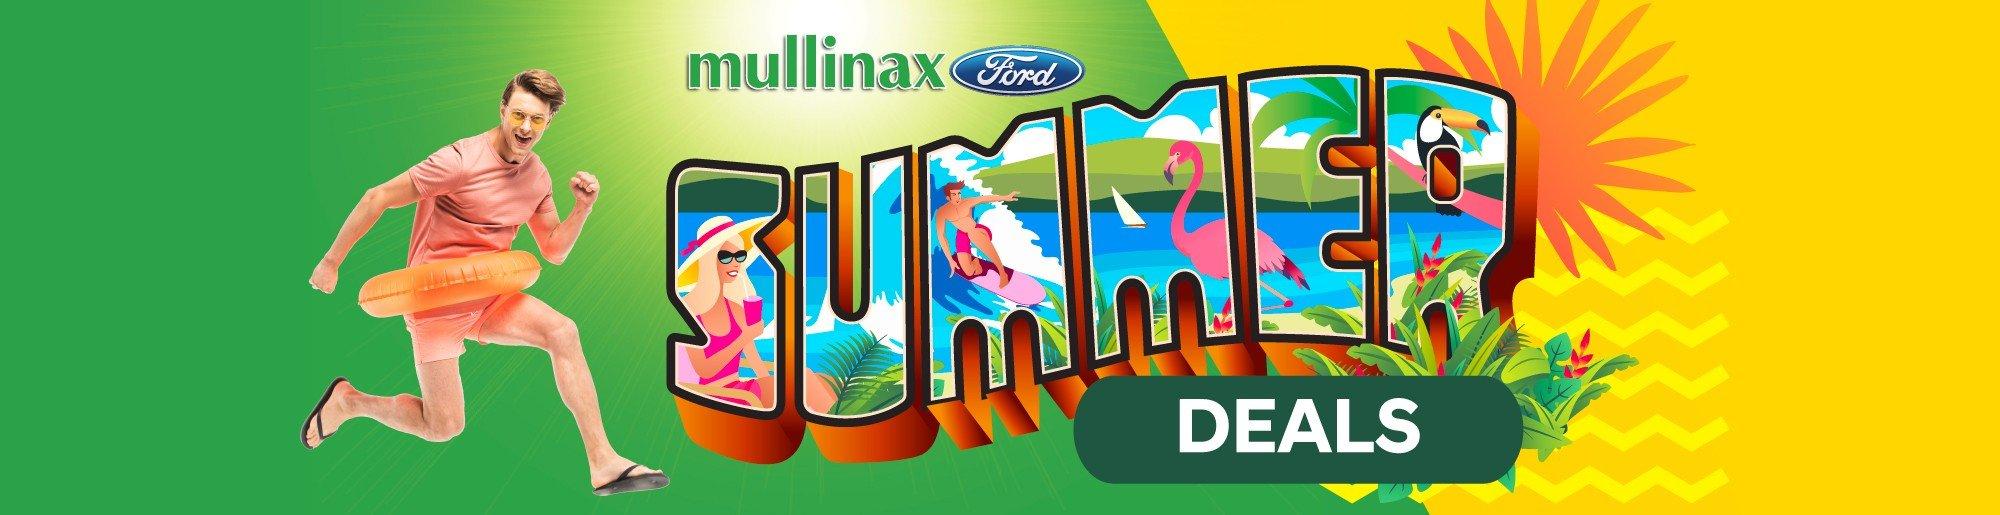 summer deals at mullinax ford